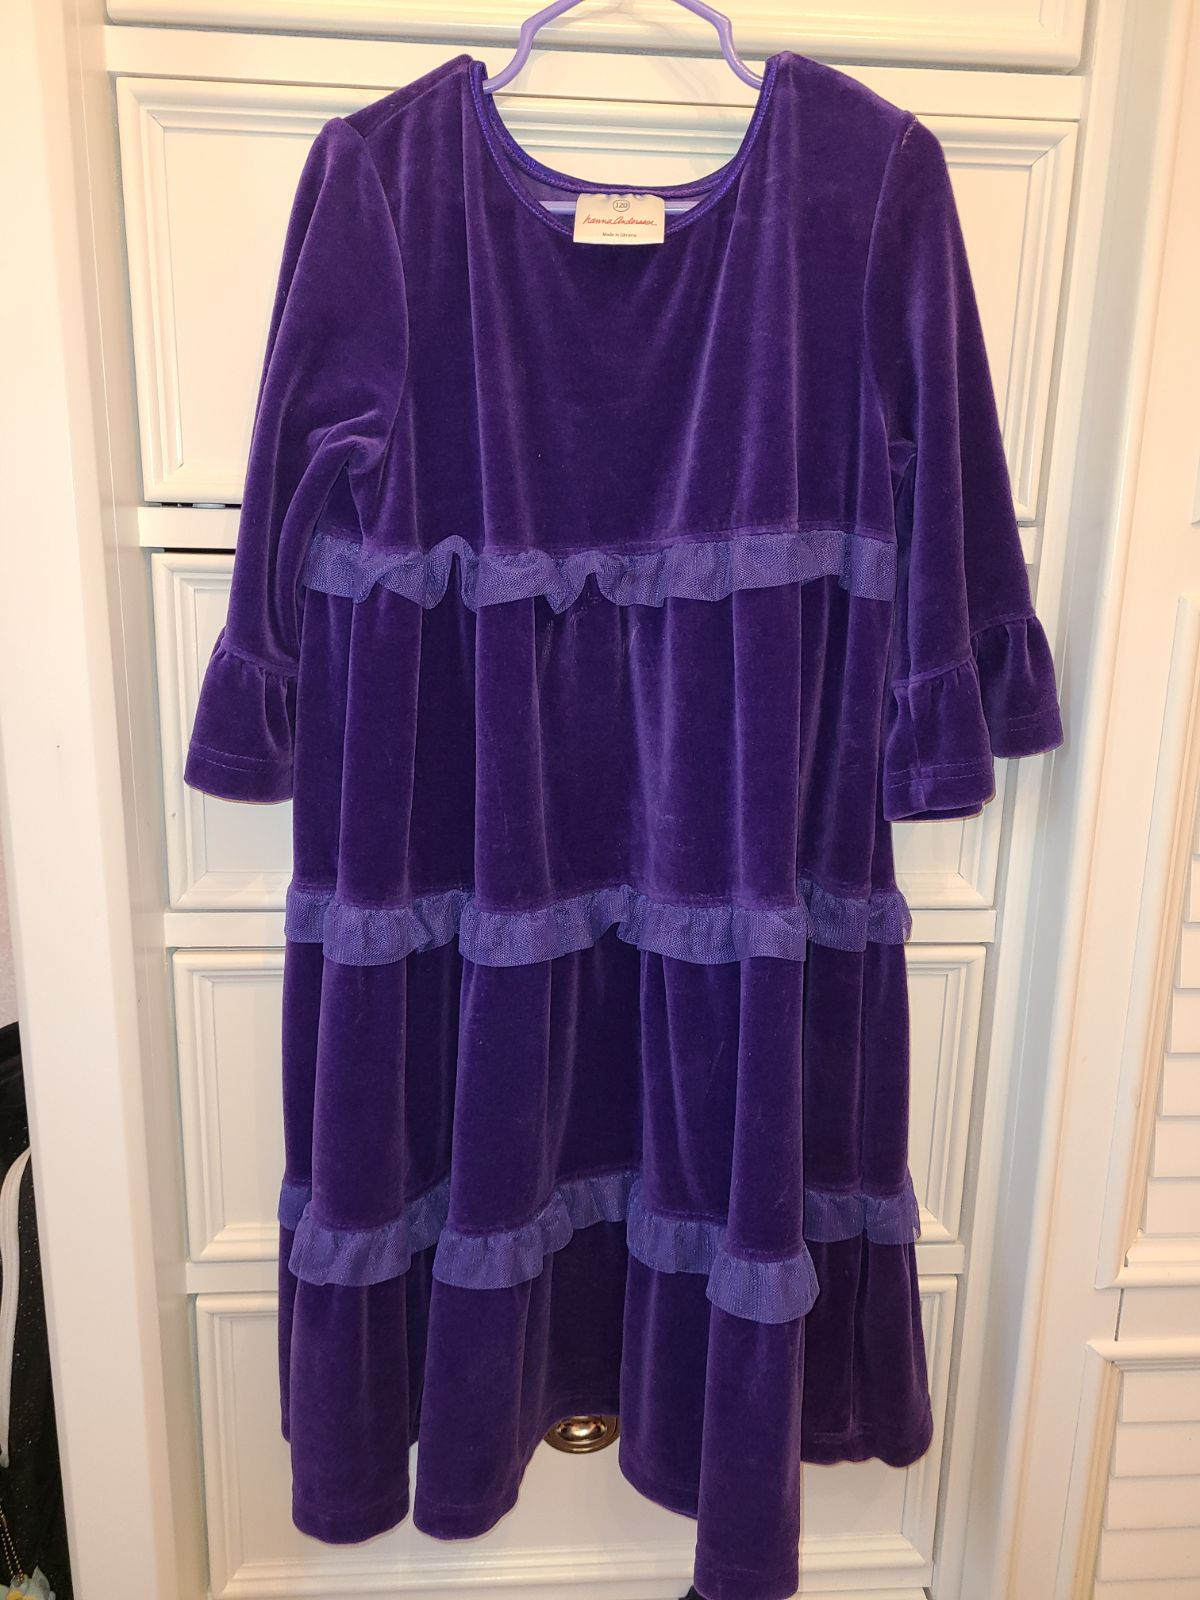 Hanna Andersson purple velvet twirl dres